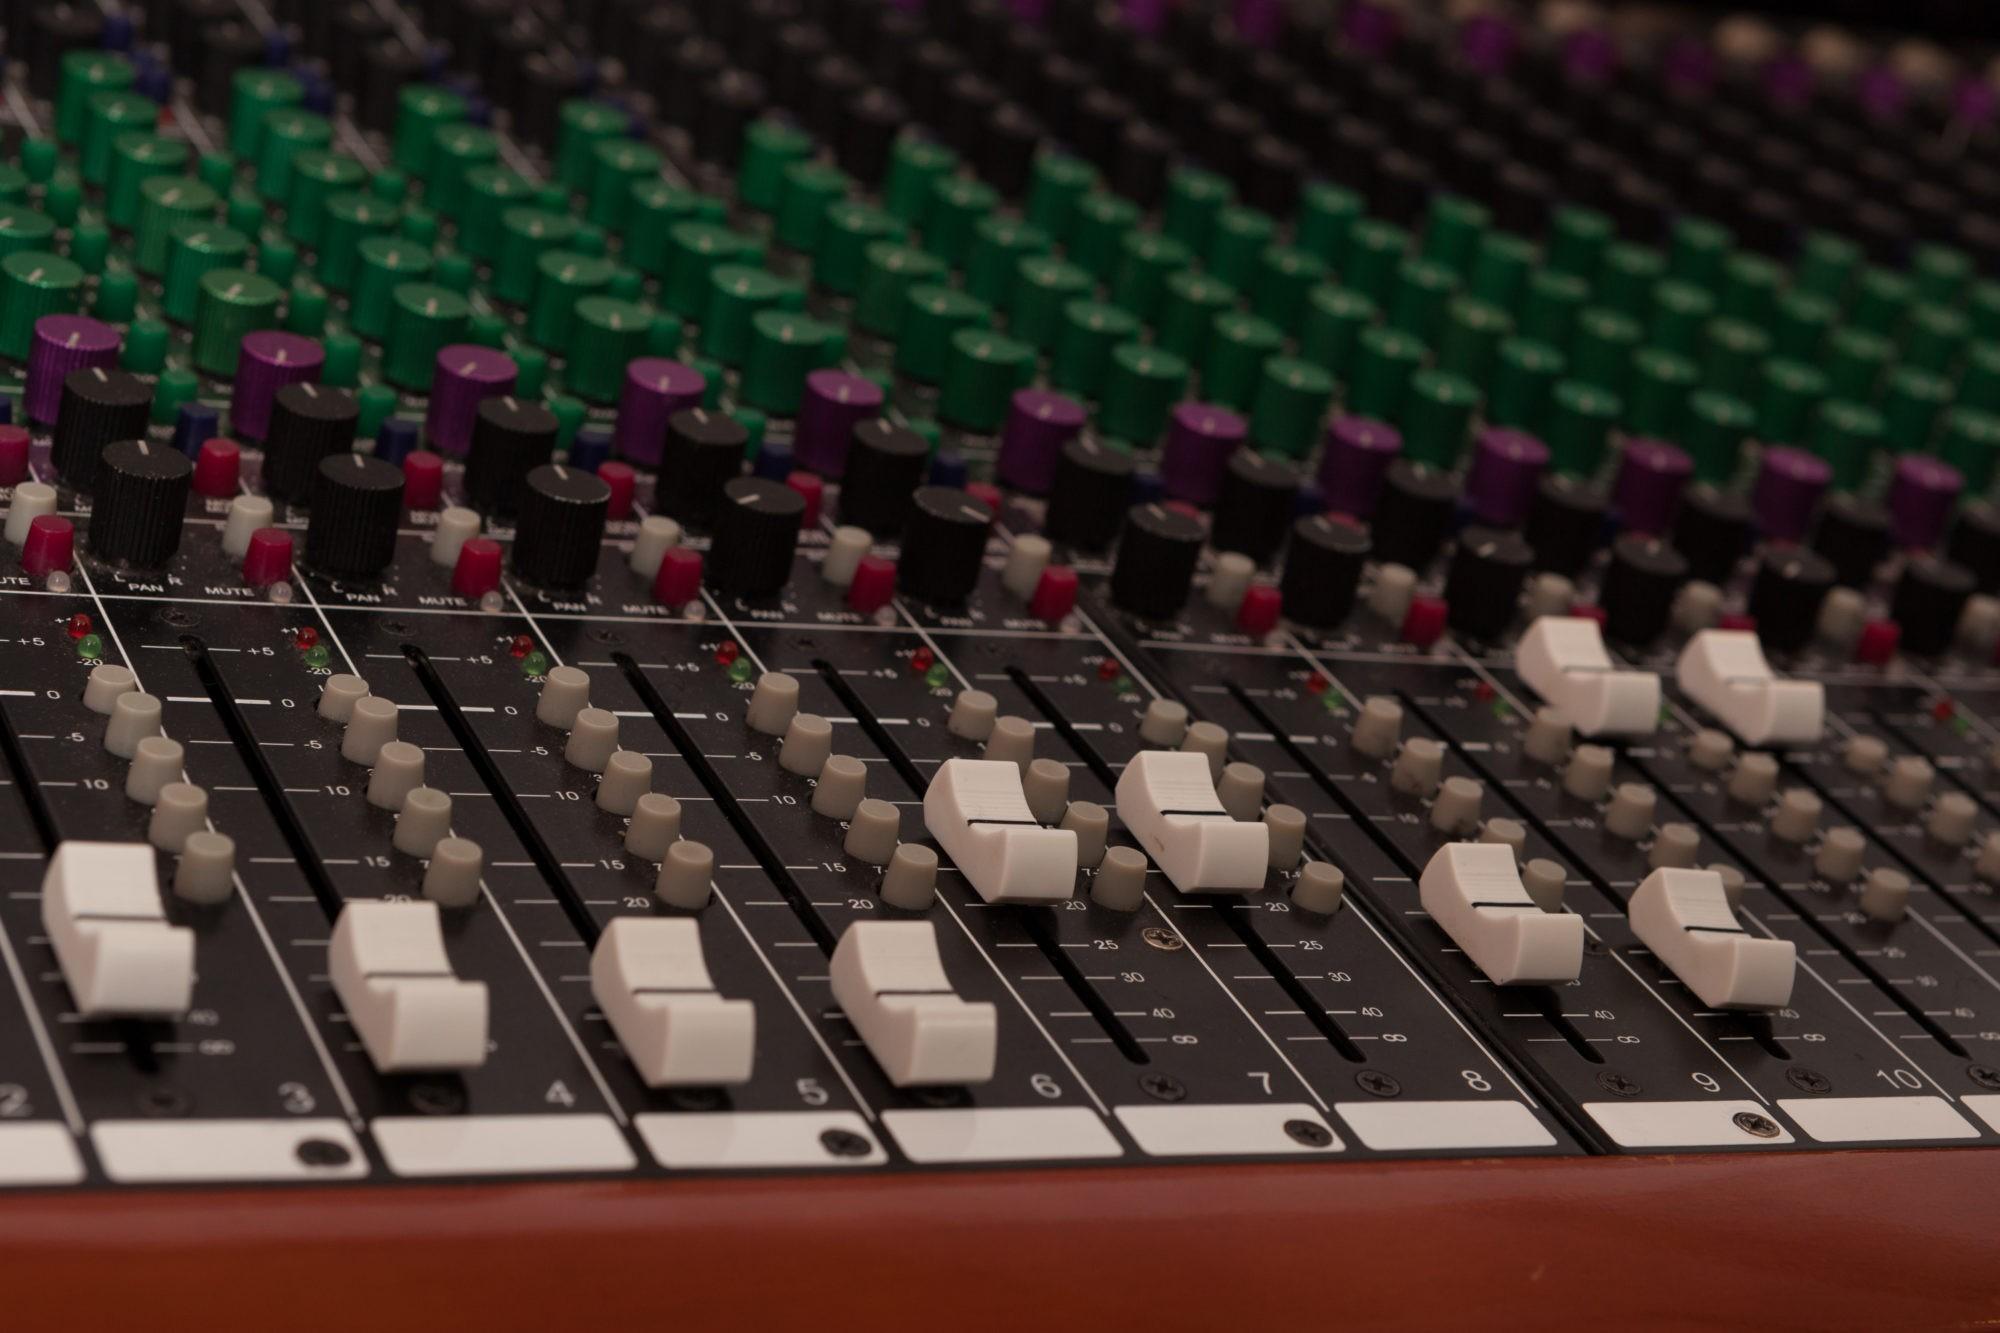 Instrumentals & Beats, Mixer, STRAINX